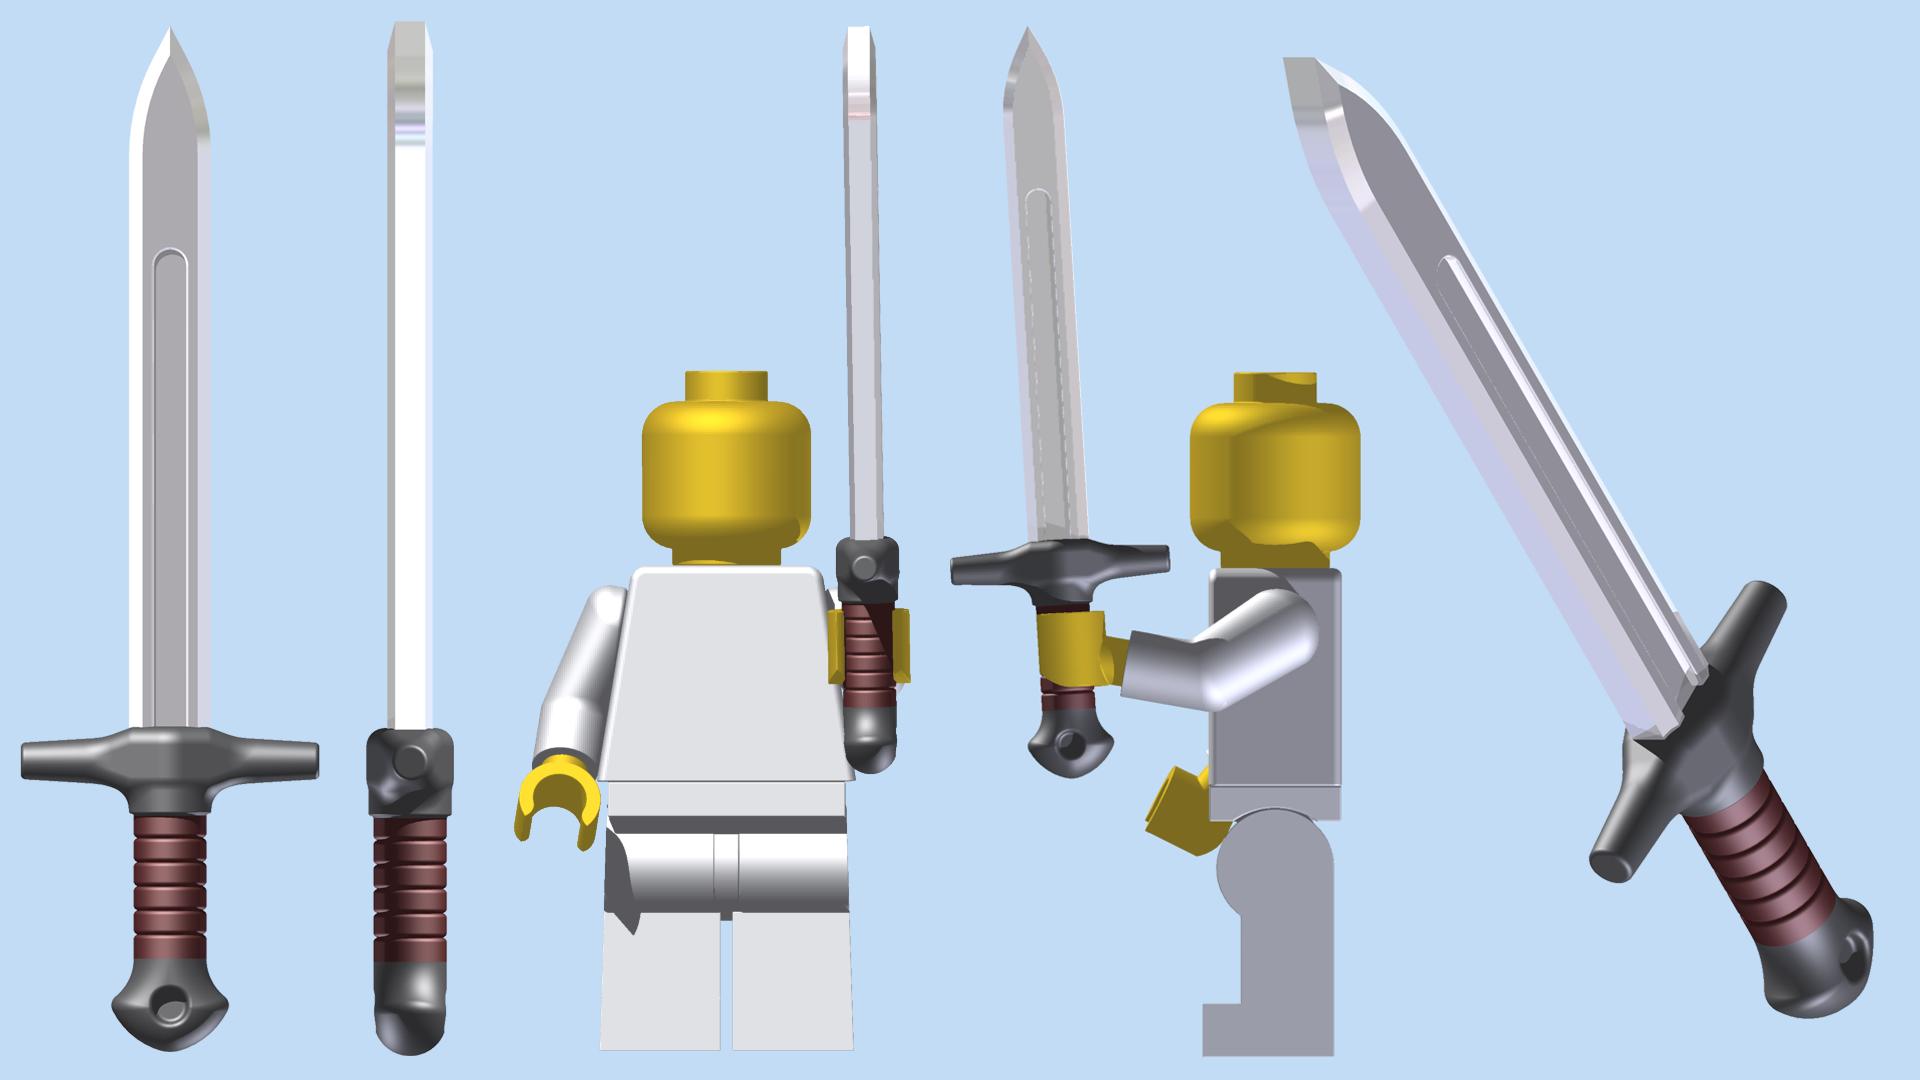 LEGO Ordon Sword by mingles